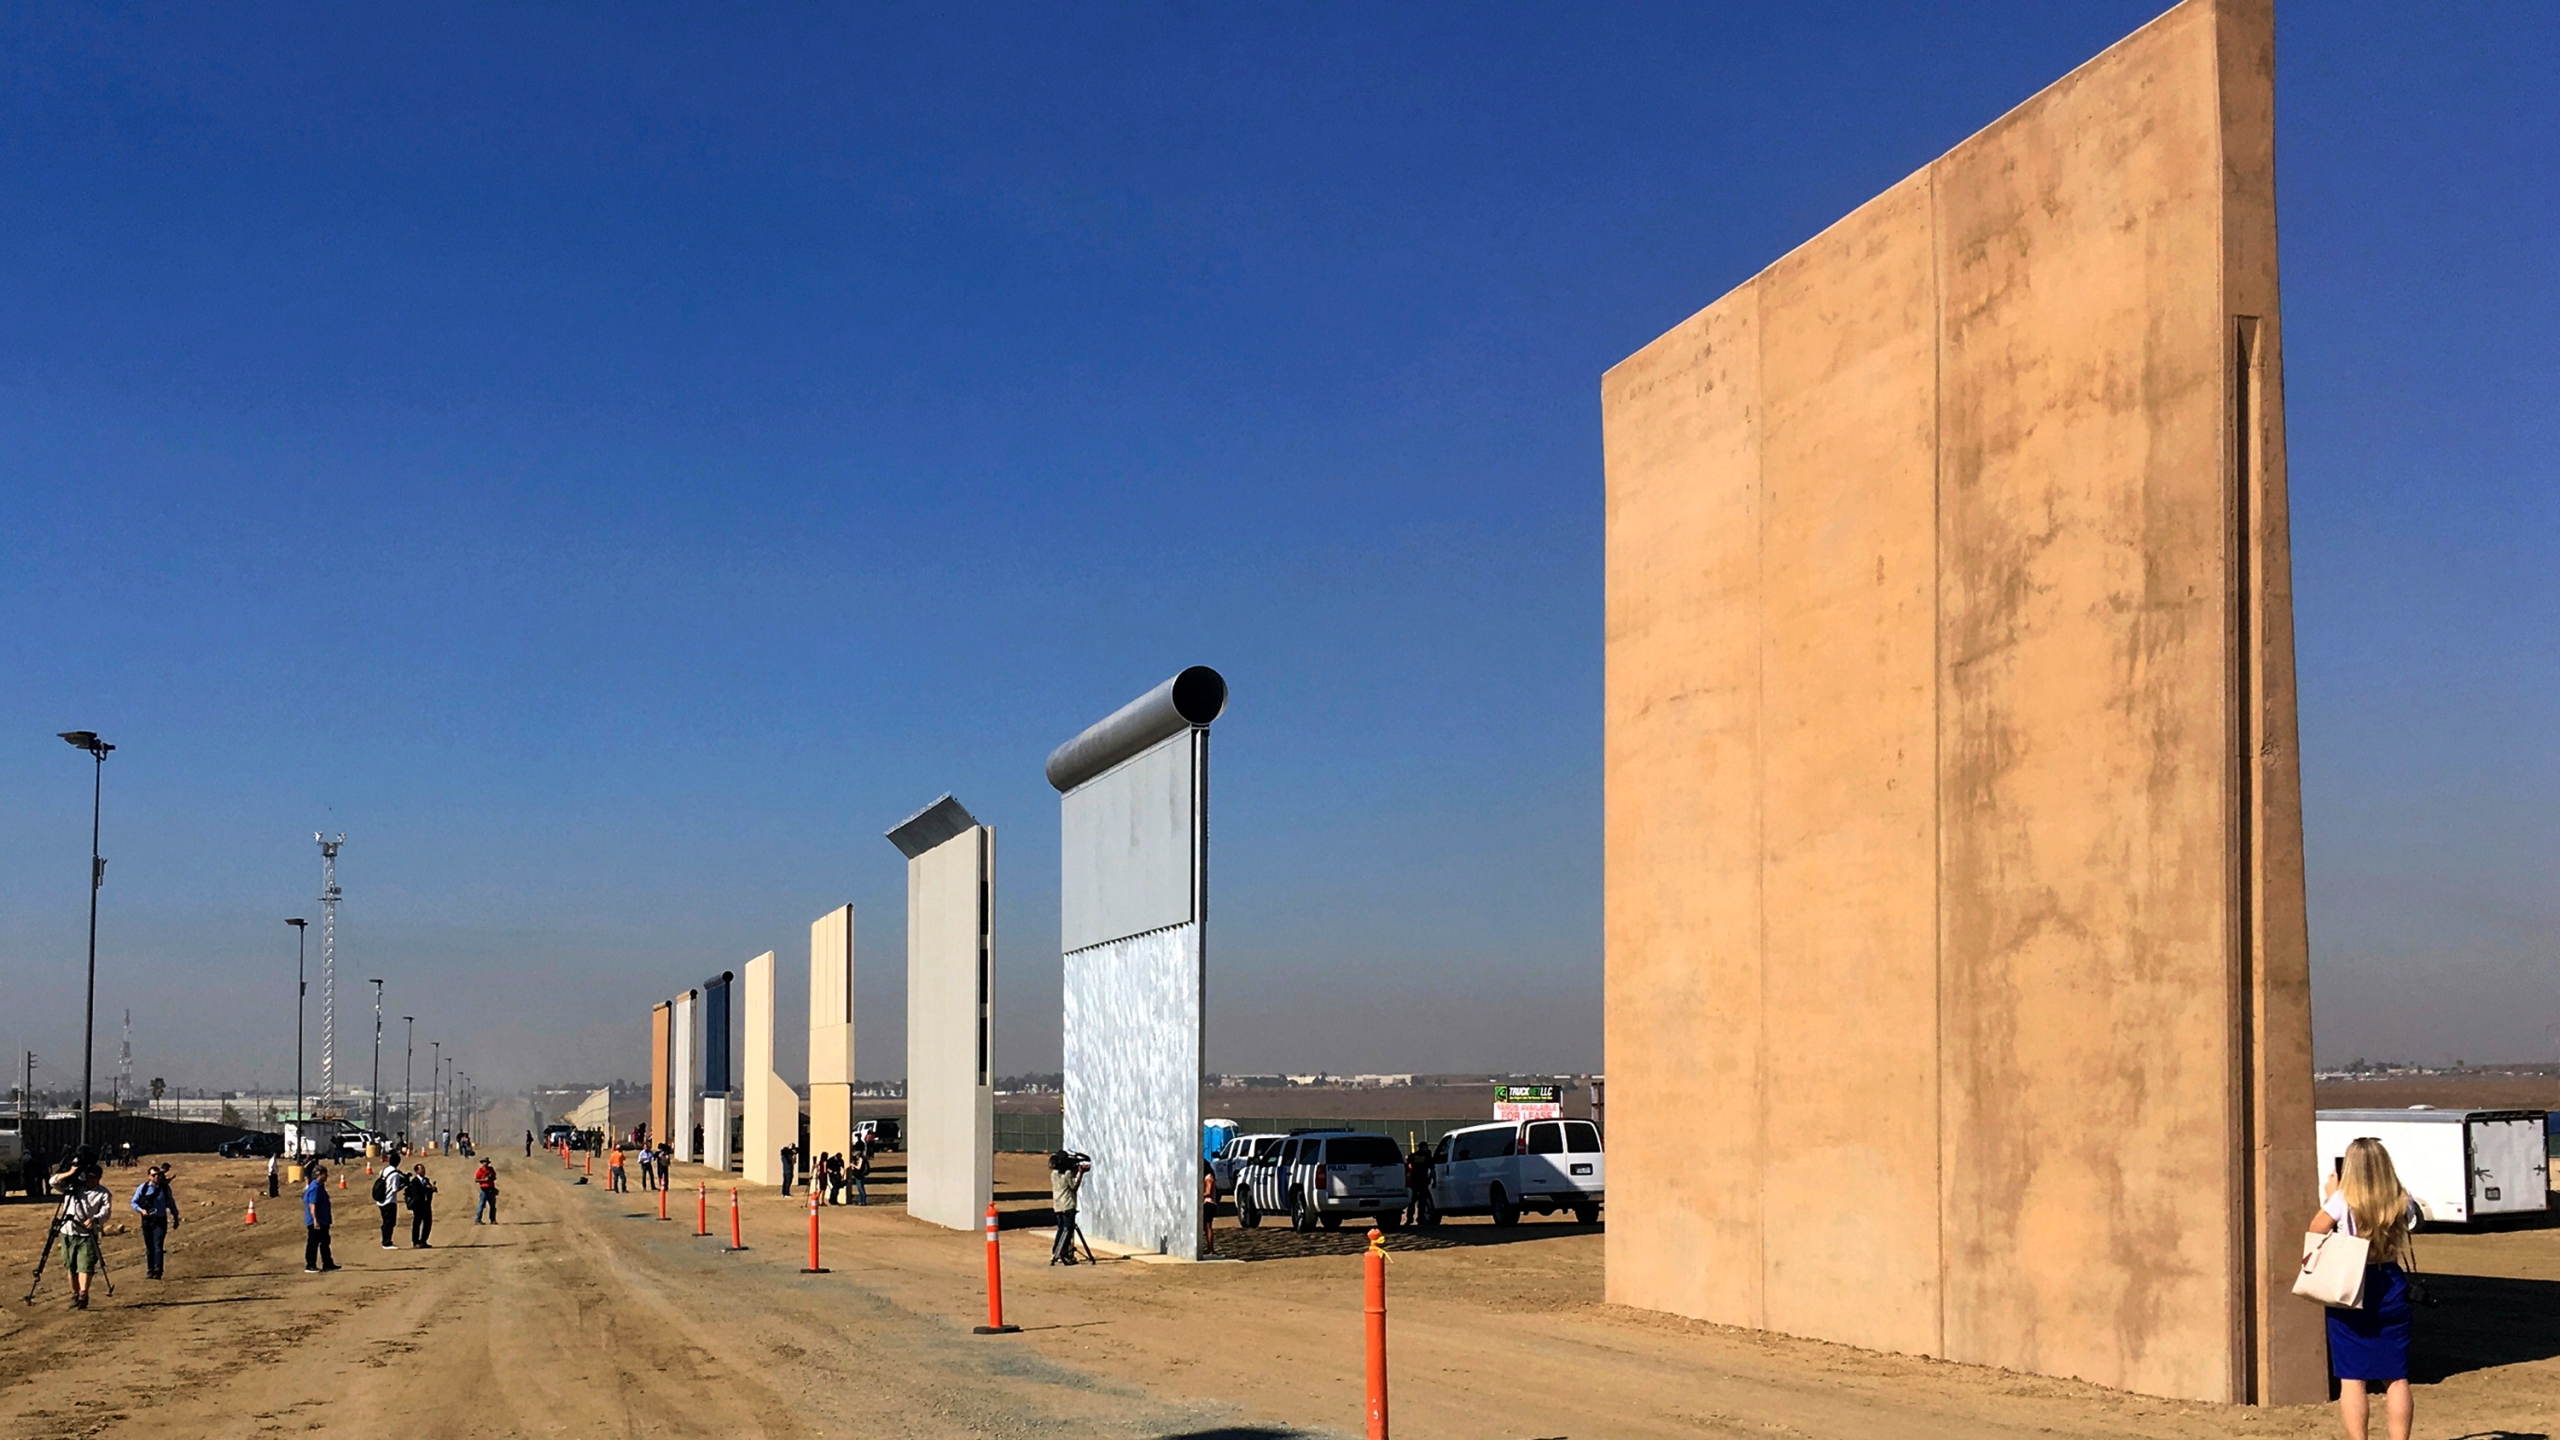 Border_Wall_Lawsuit_96131-159532.jpg14423828